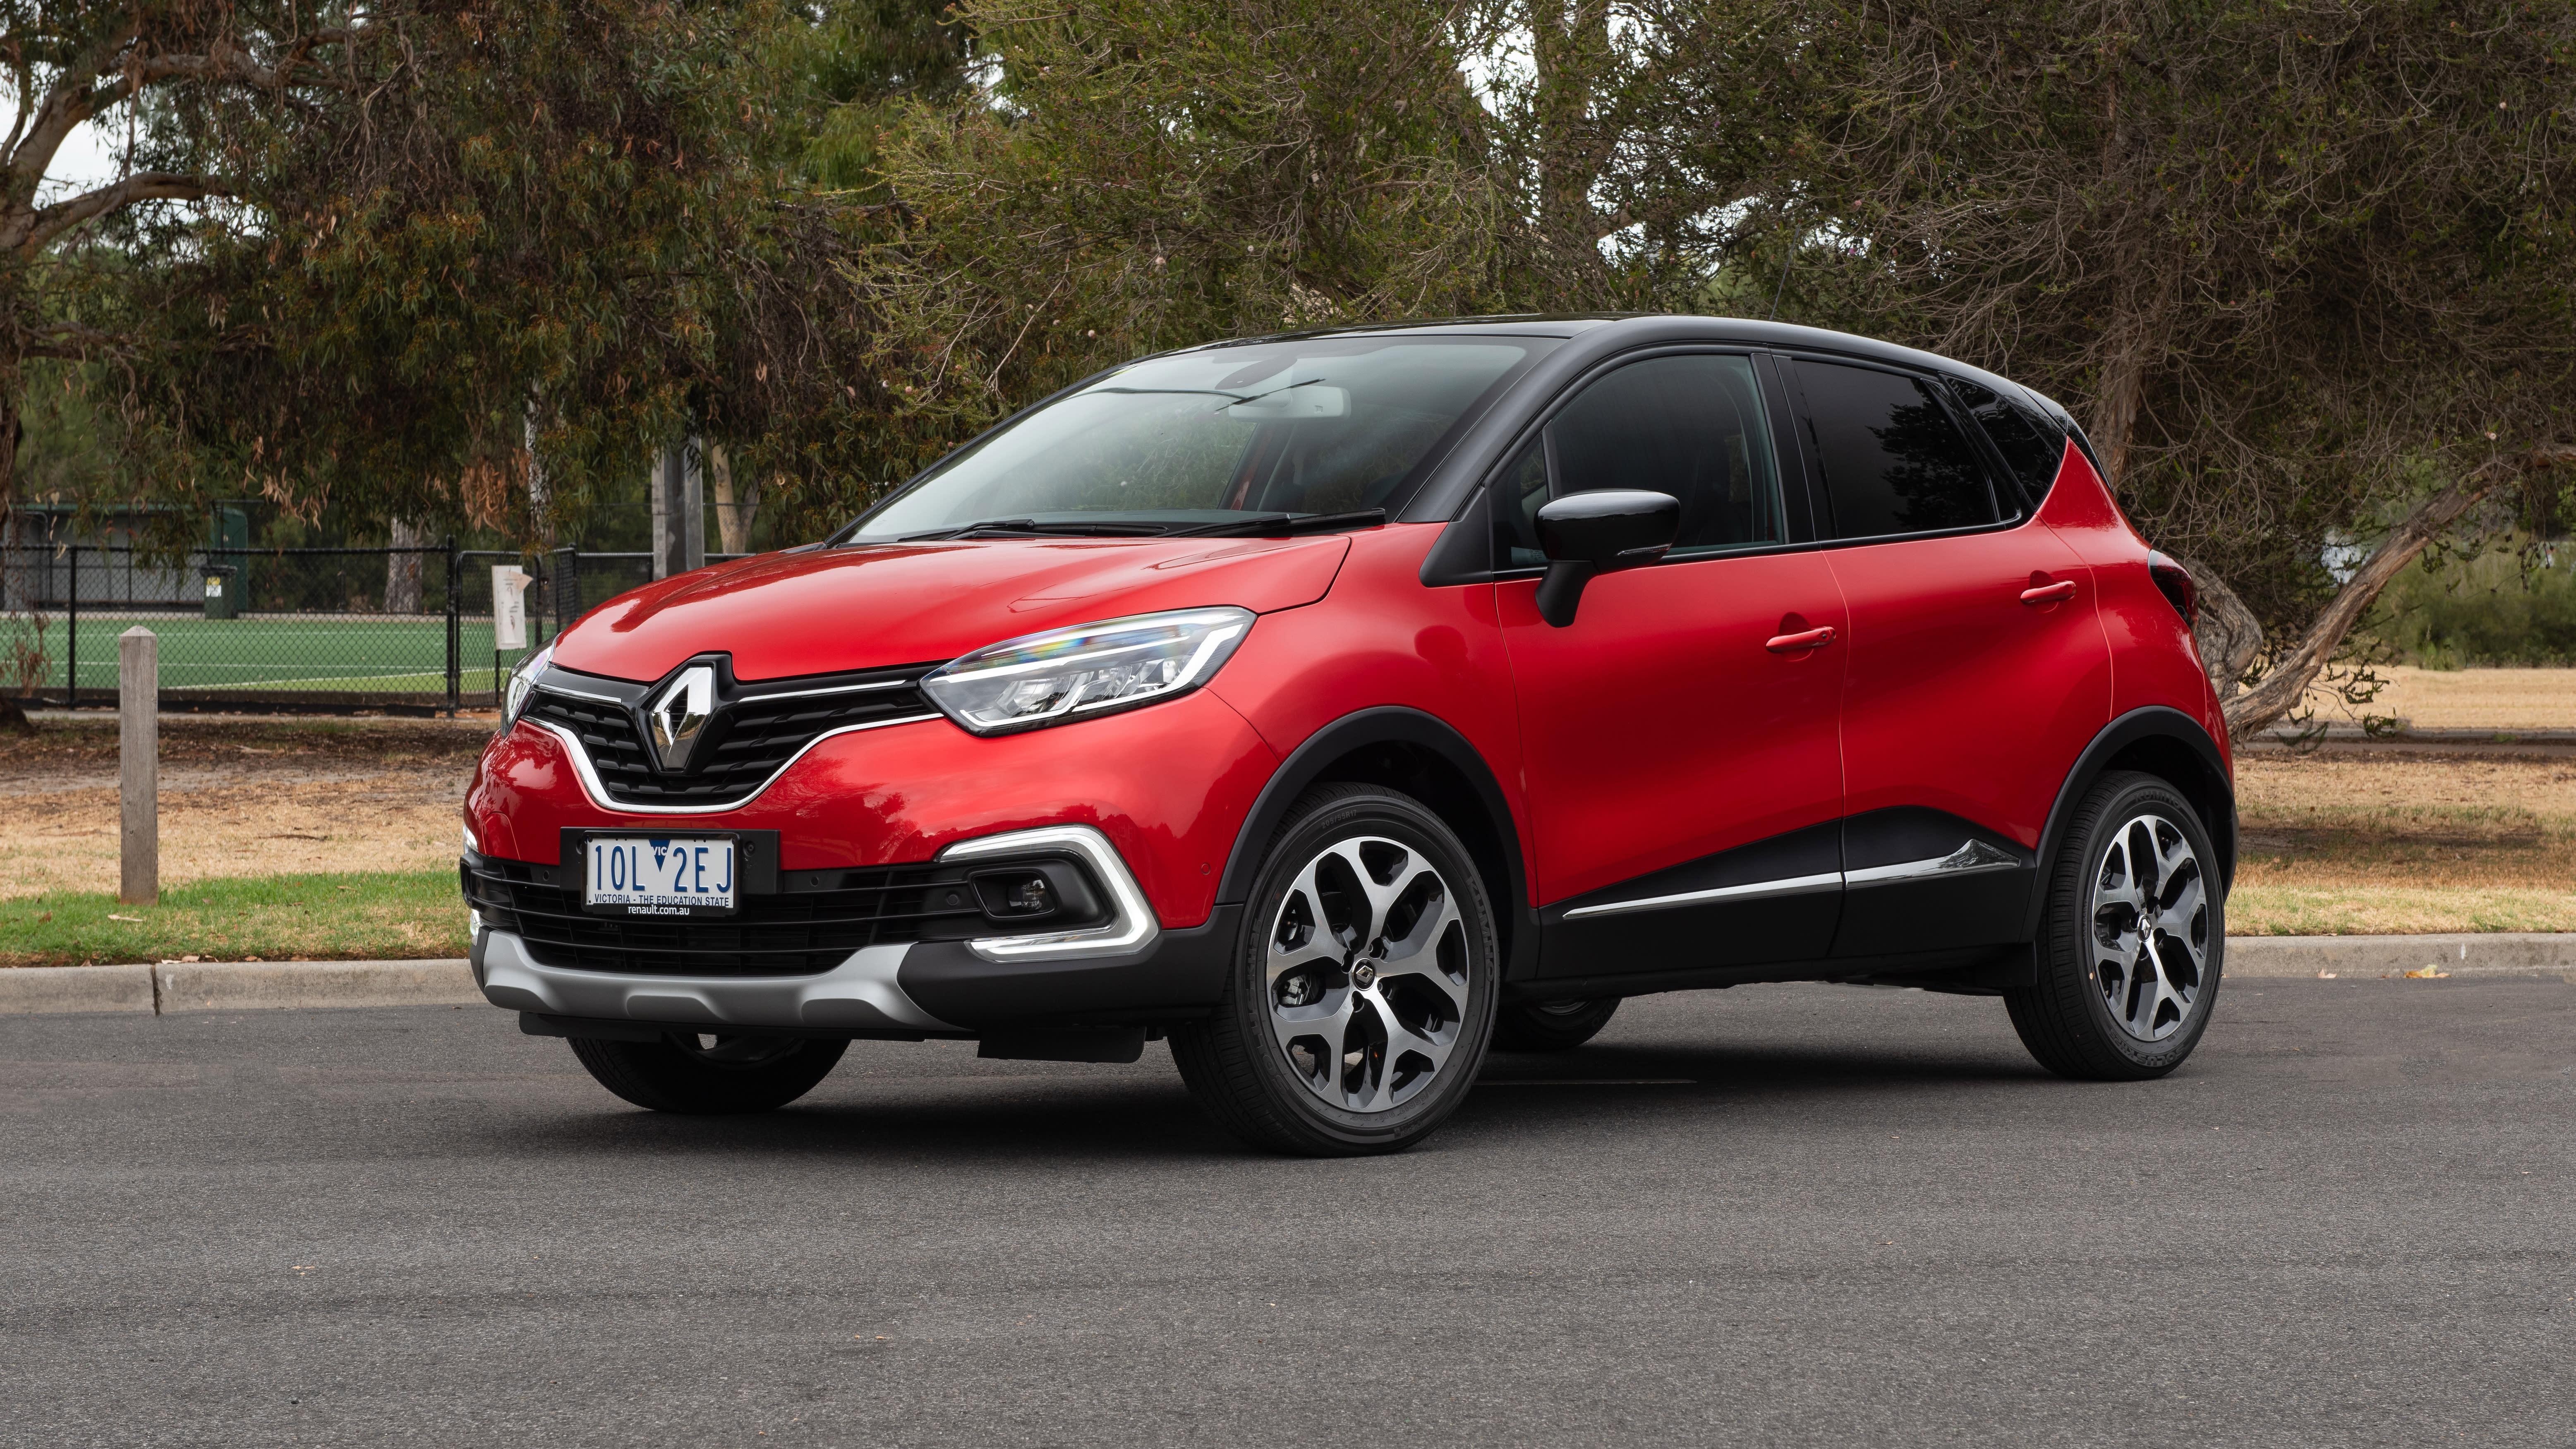 2019 Renault Captur Review Intens 1 3t Caradvice